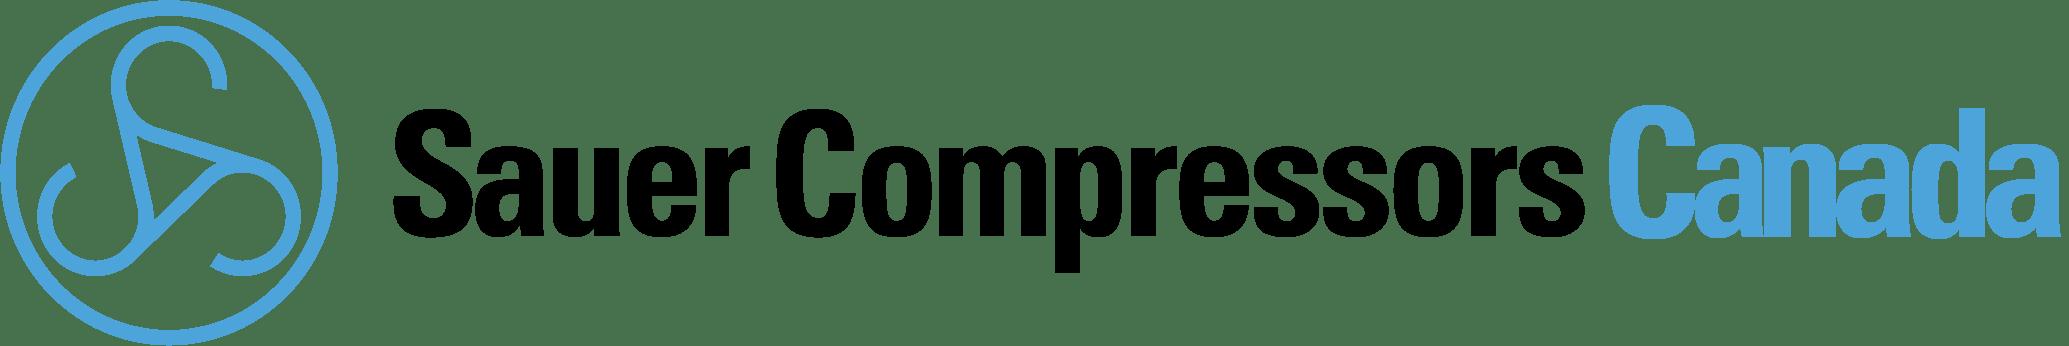 Sauer Compressors Canada